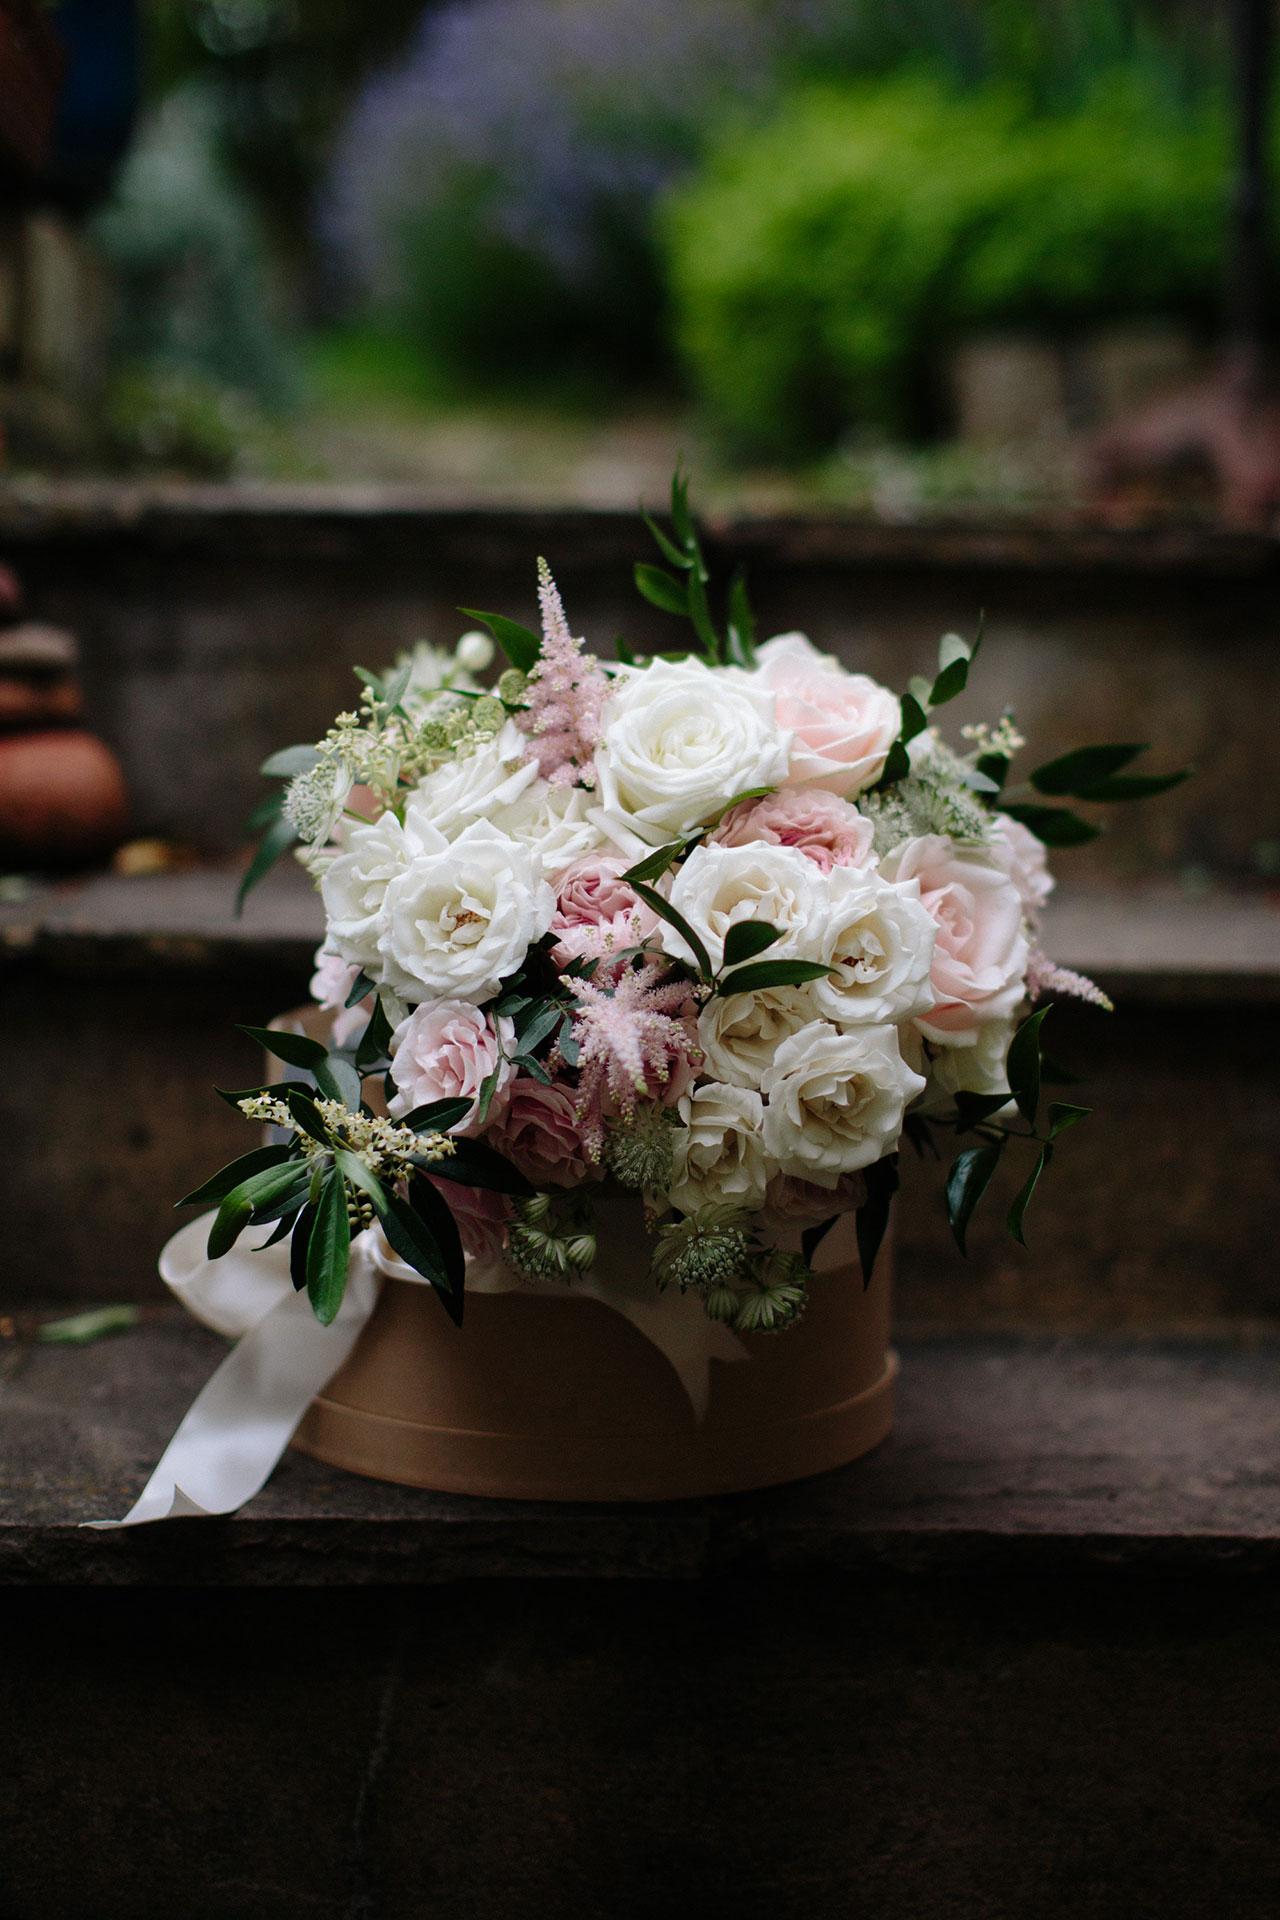 Syon-Park-Wedding-Photographer--_-Michael-Newington-Gray-53.jpg